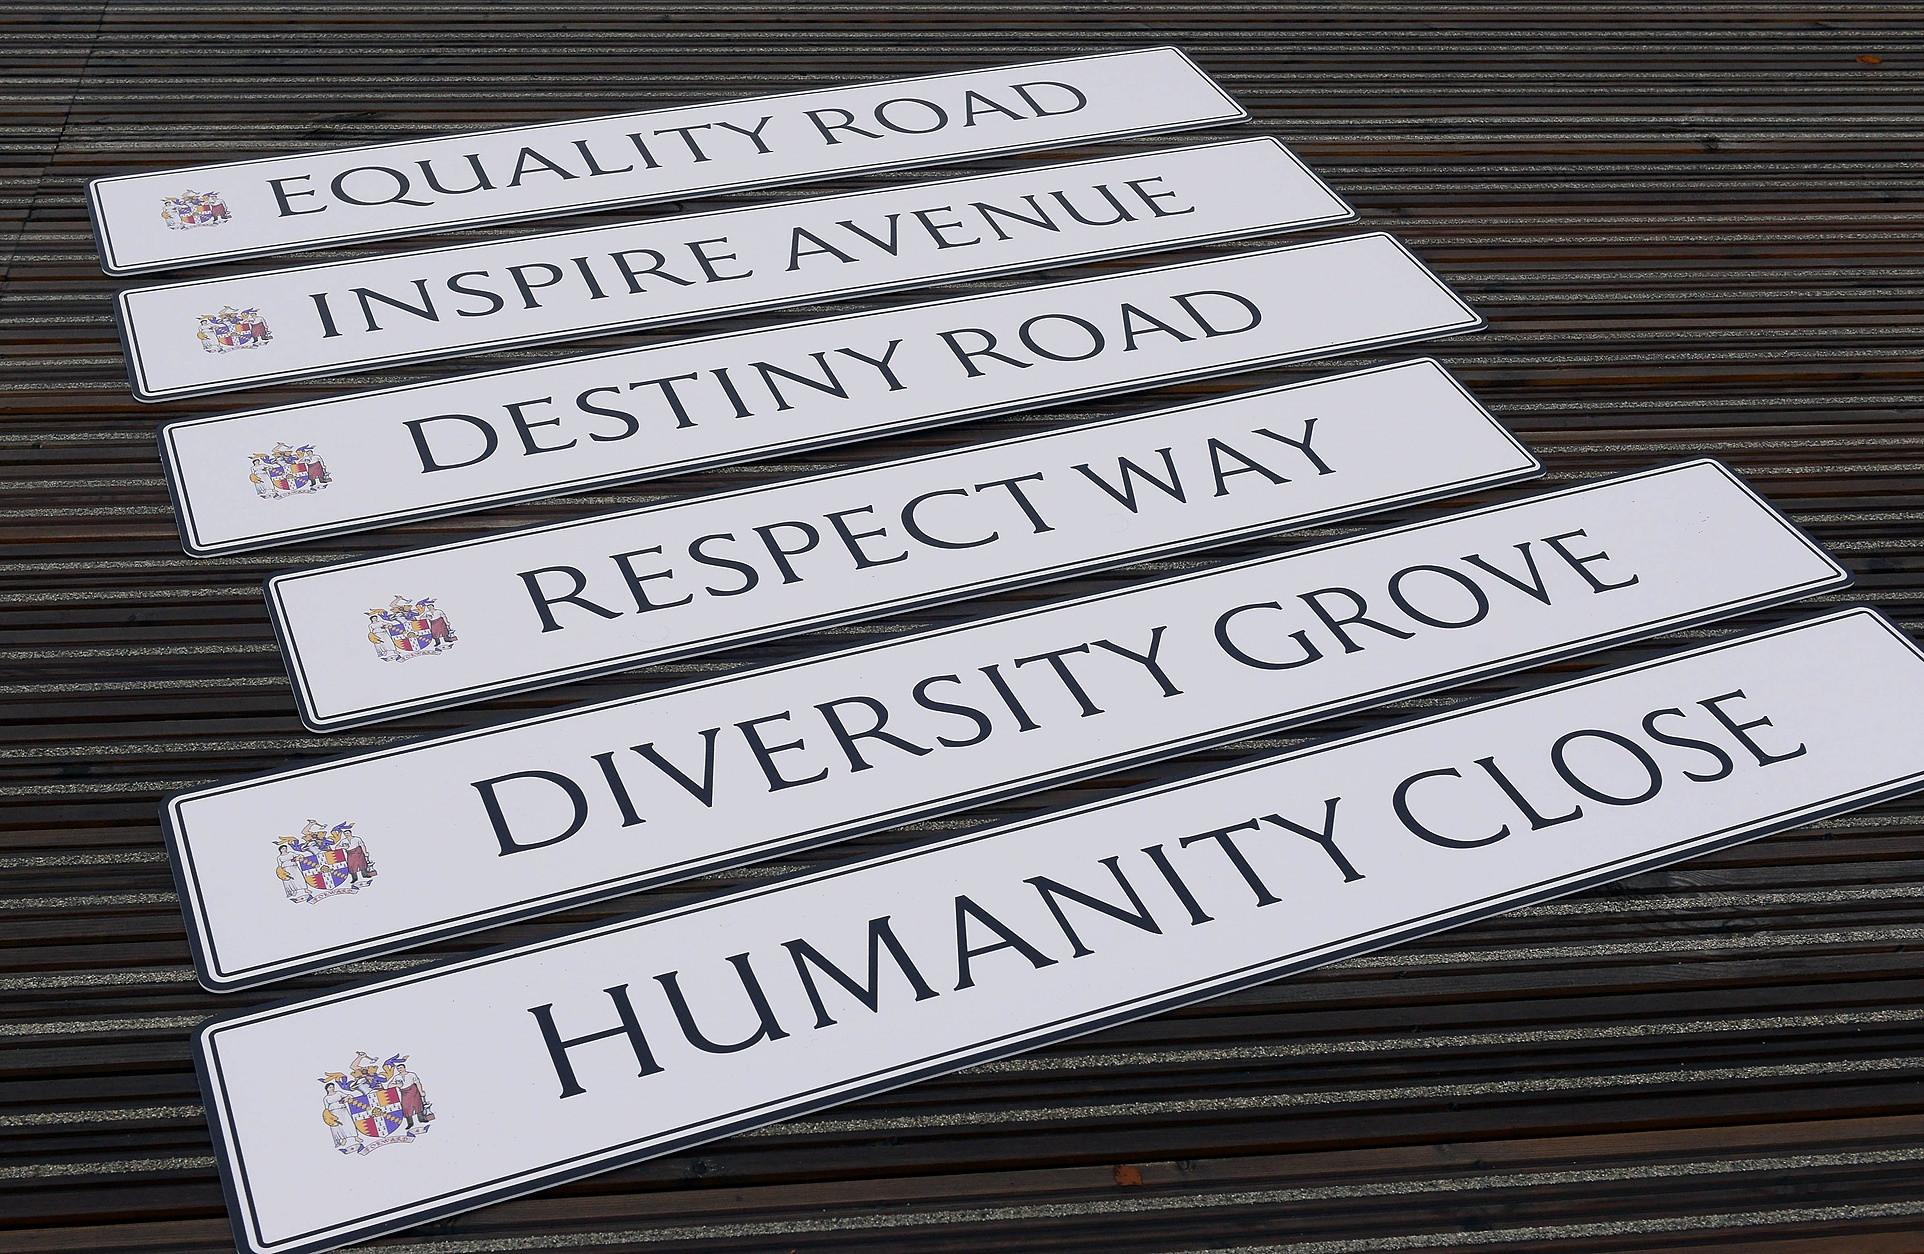 Commonwealth Sport Movement values inspire new street names in Birmingham